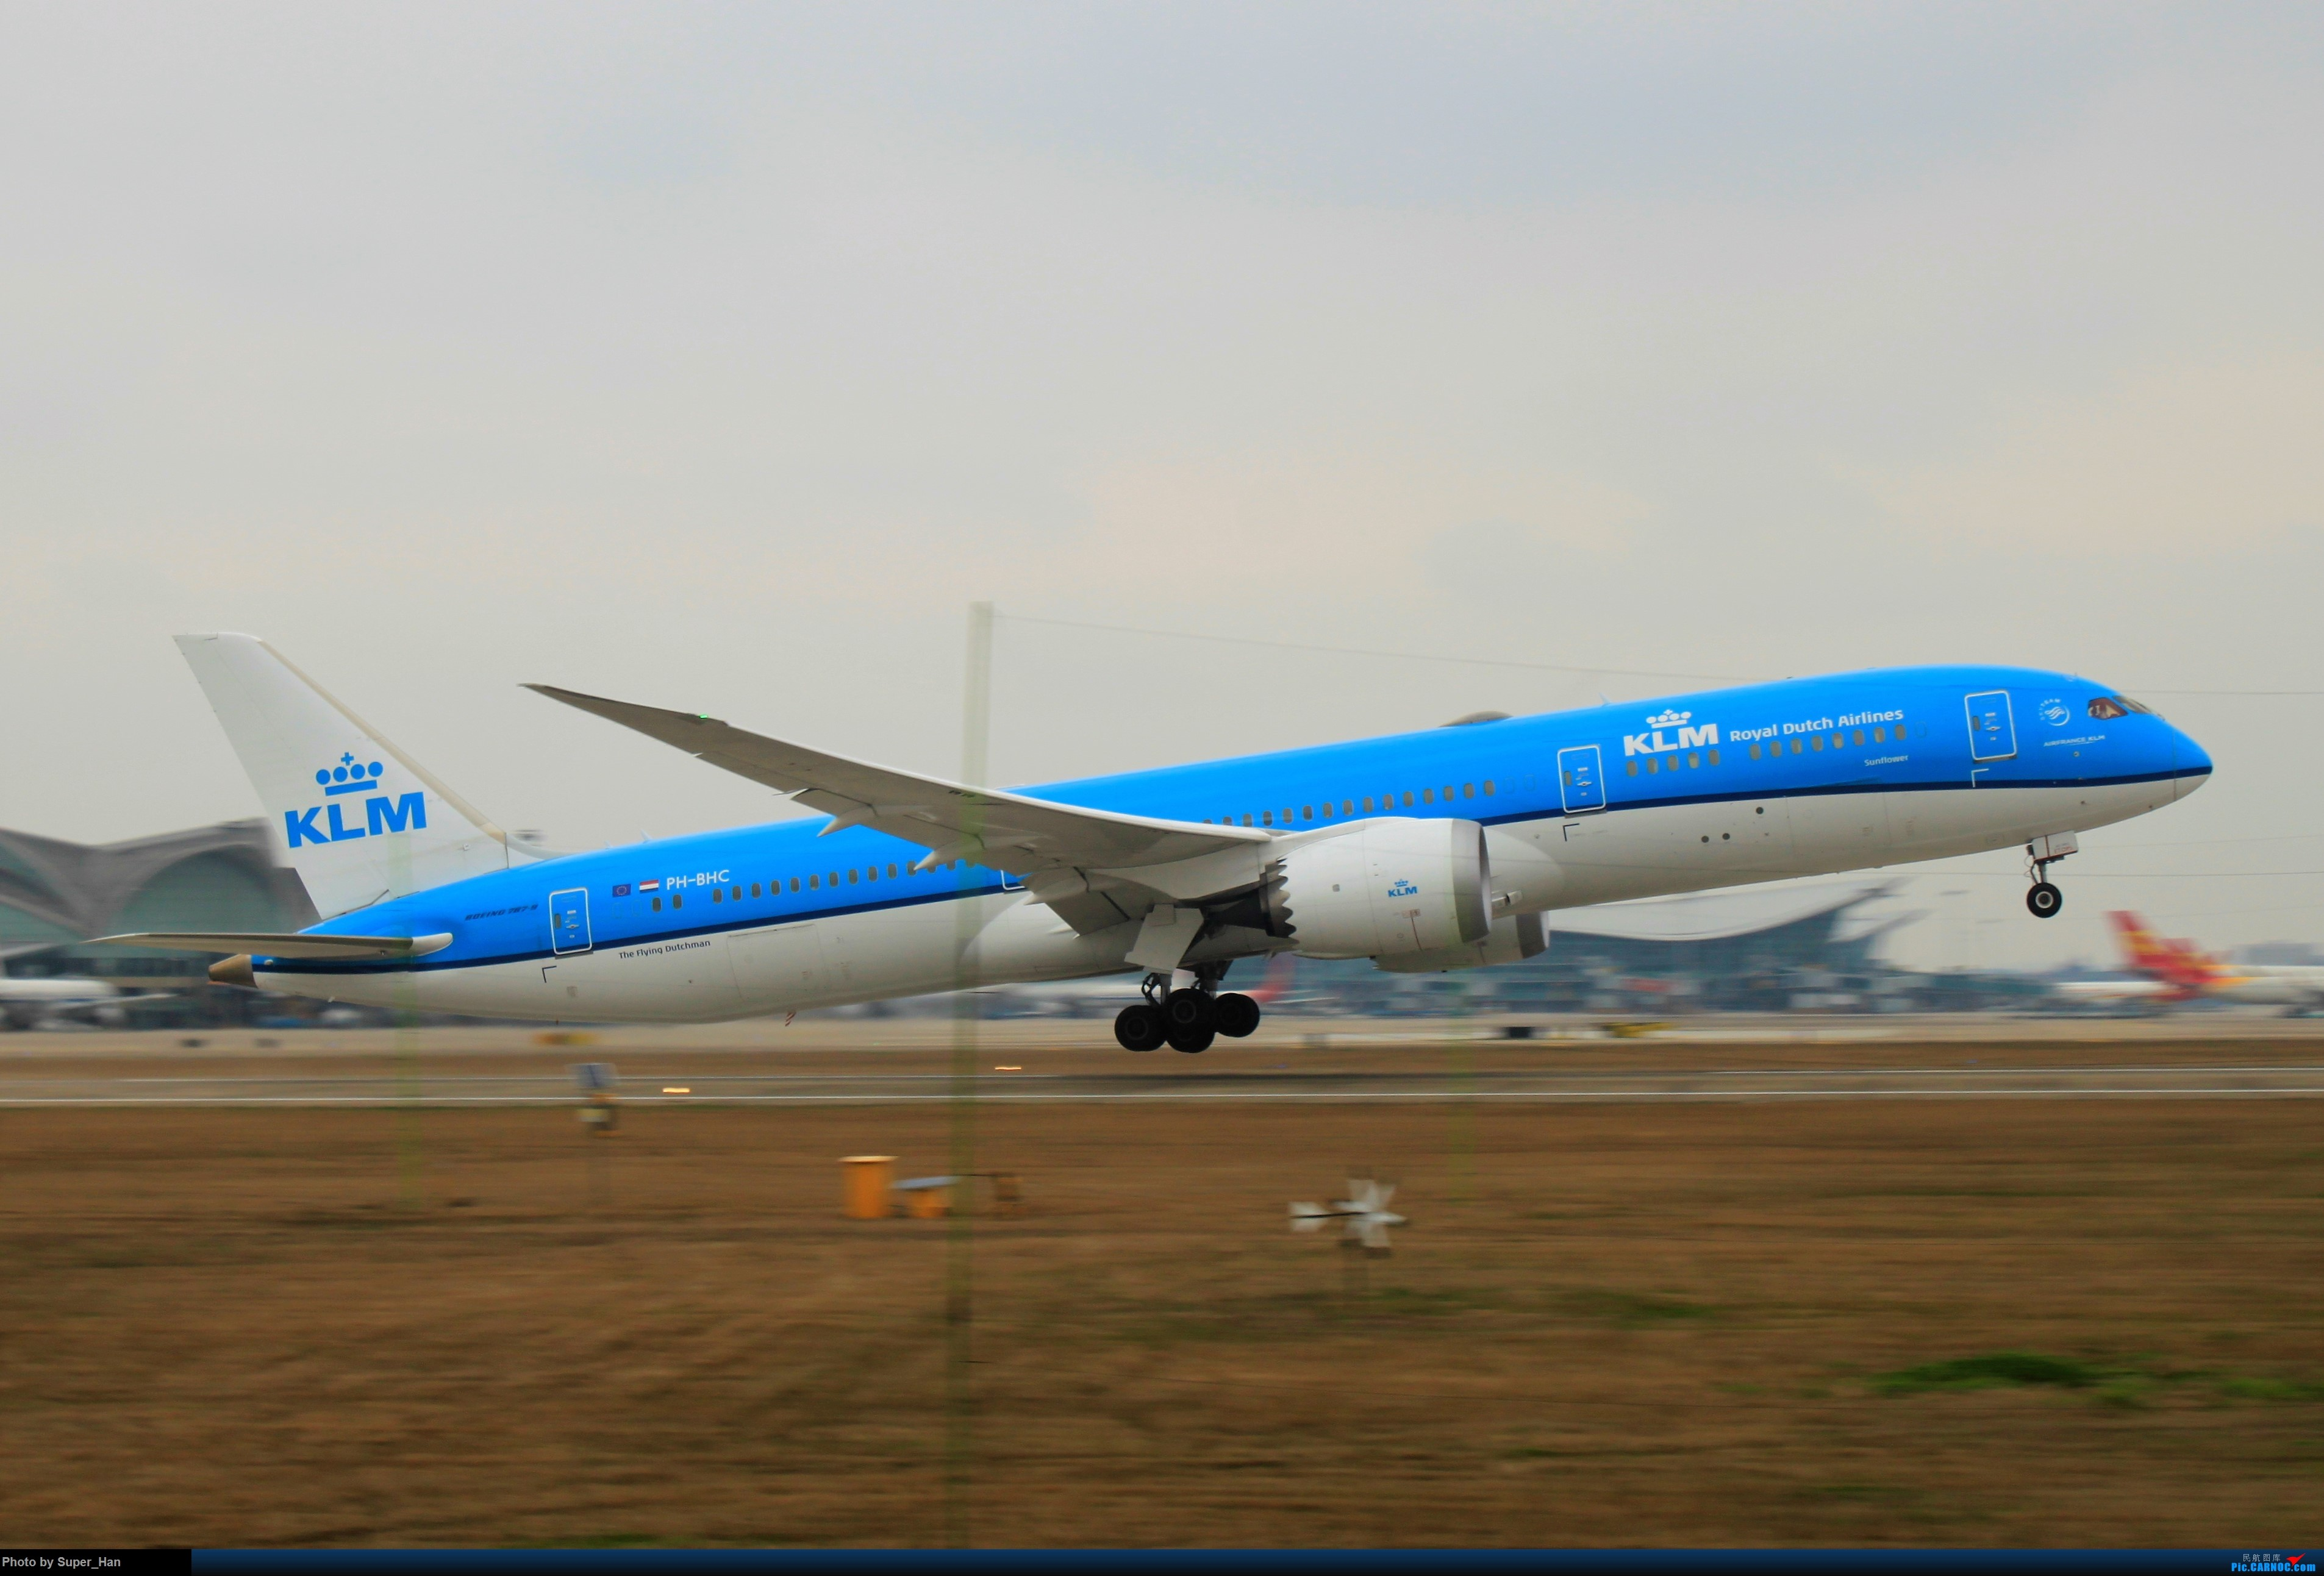 Re:[原创]0217再访HGH BOEING 787-9 PH-BHC 中国杭州萧山国际机场